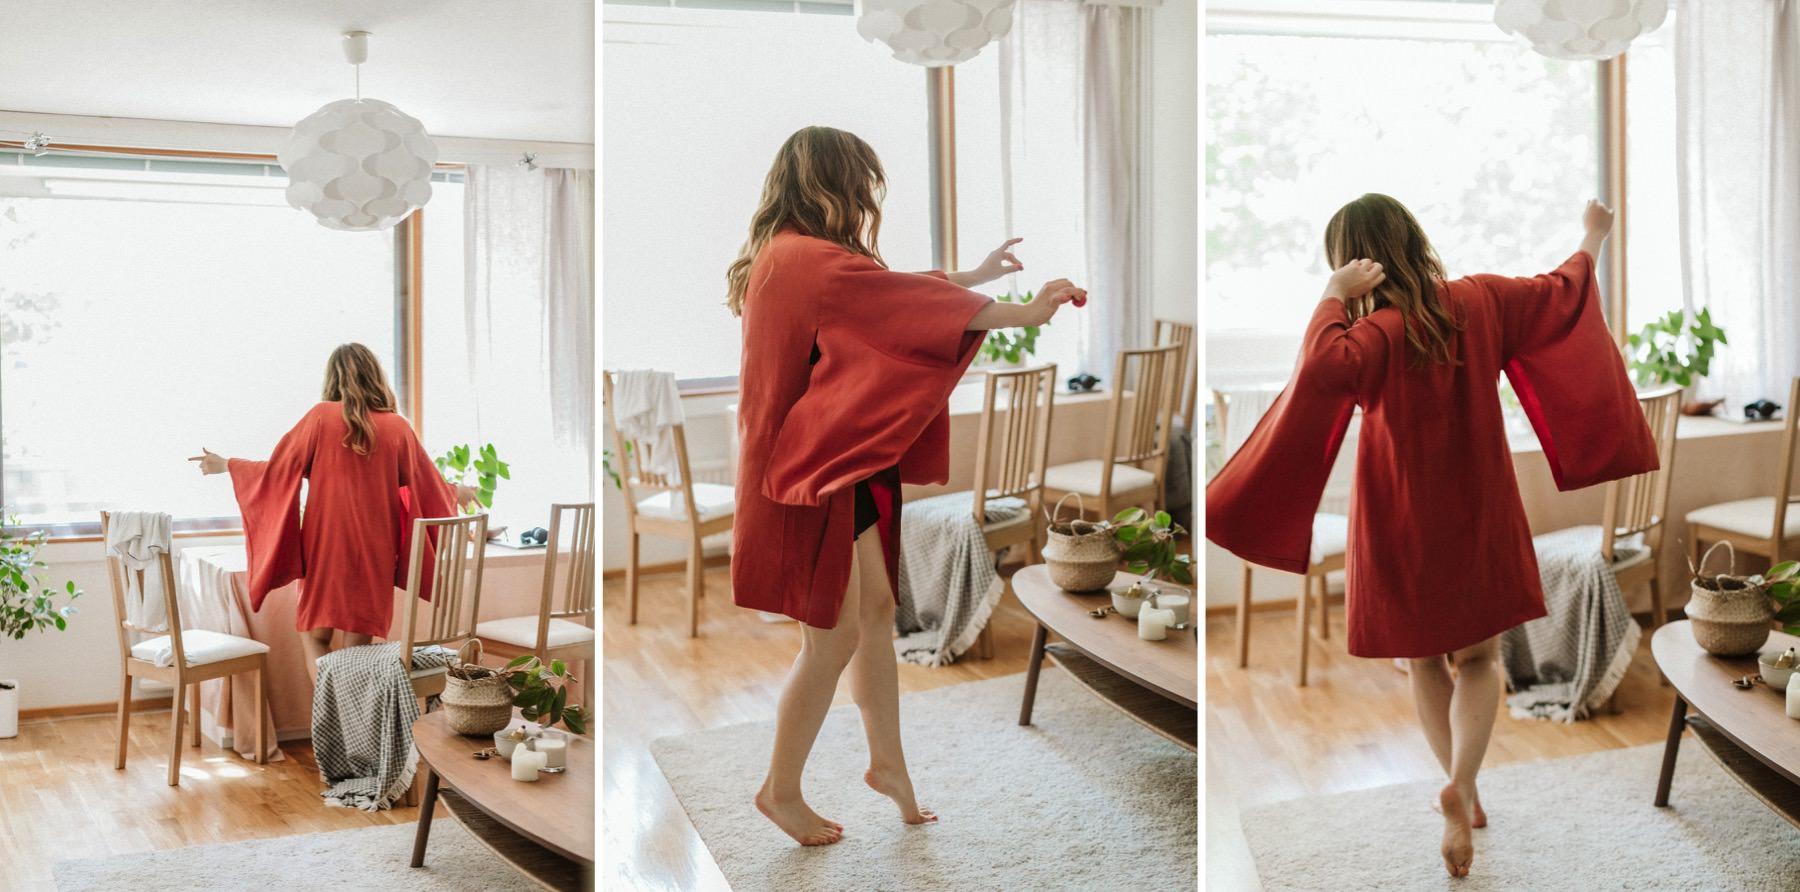 dancing in a red kimono